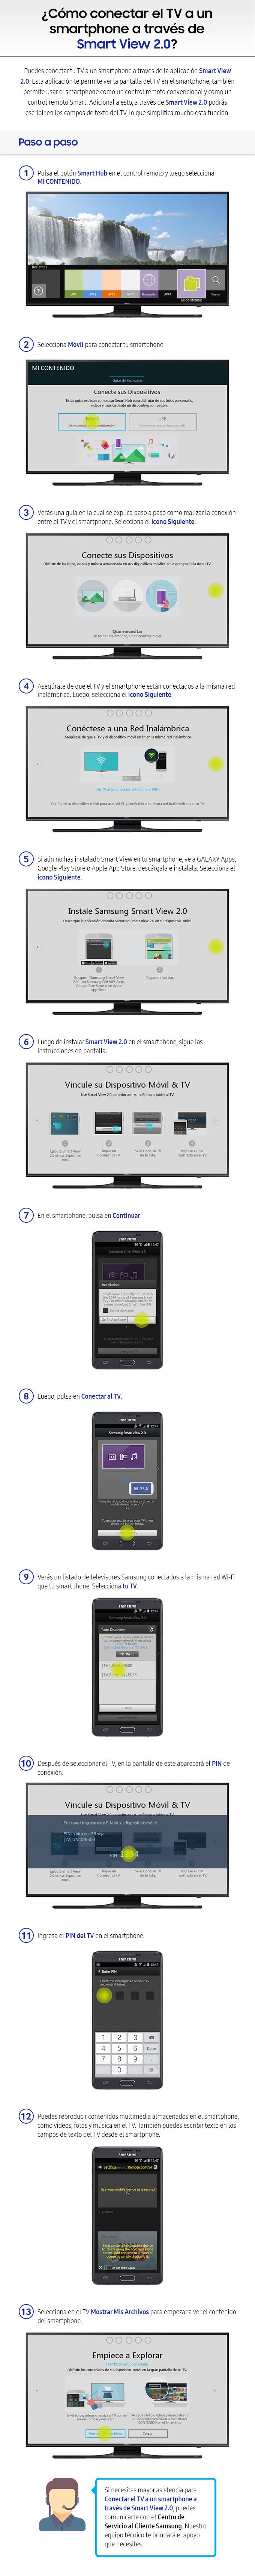 Como conectar el TV a un smartphone a través de Smart View 2